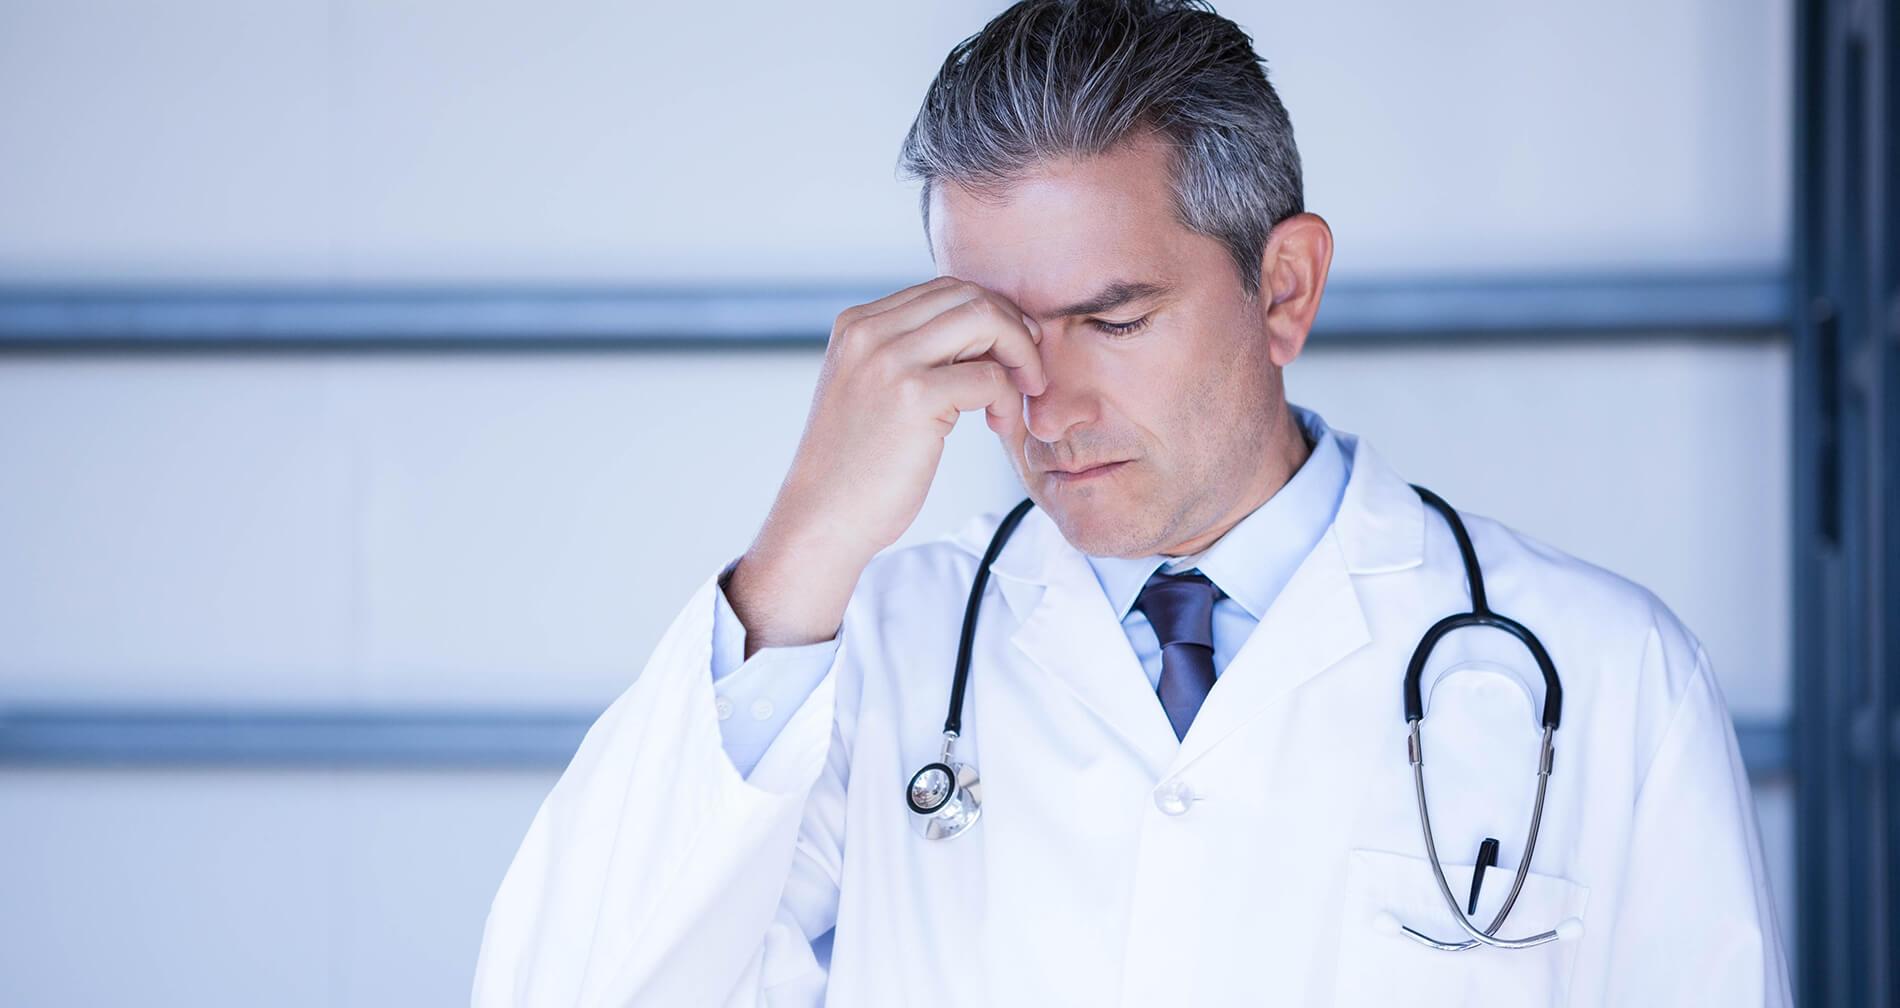 medical malpractice doctor